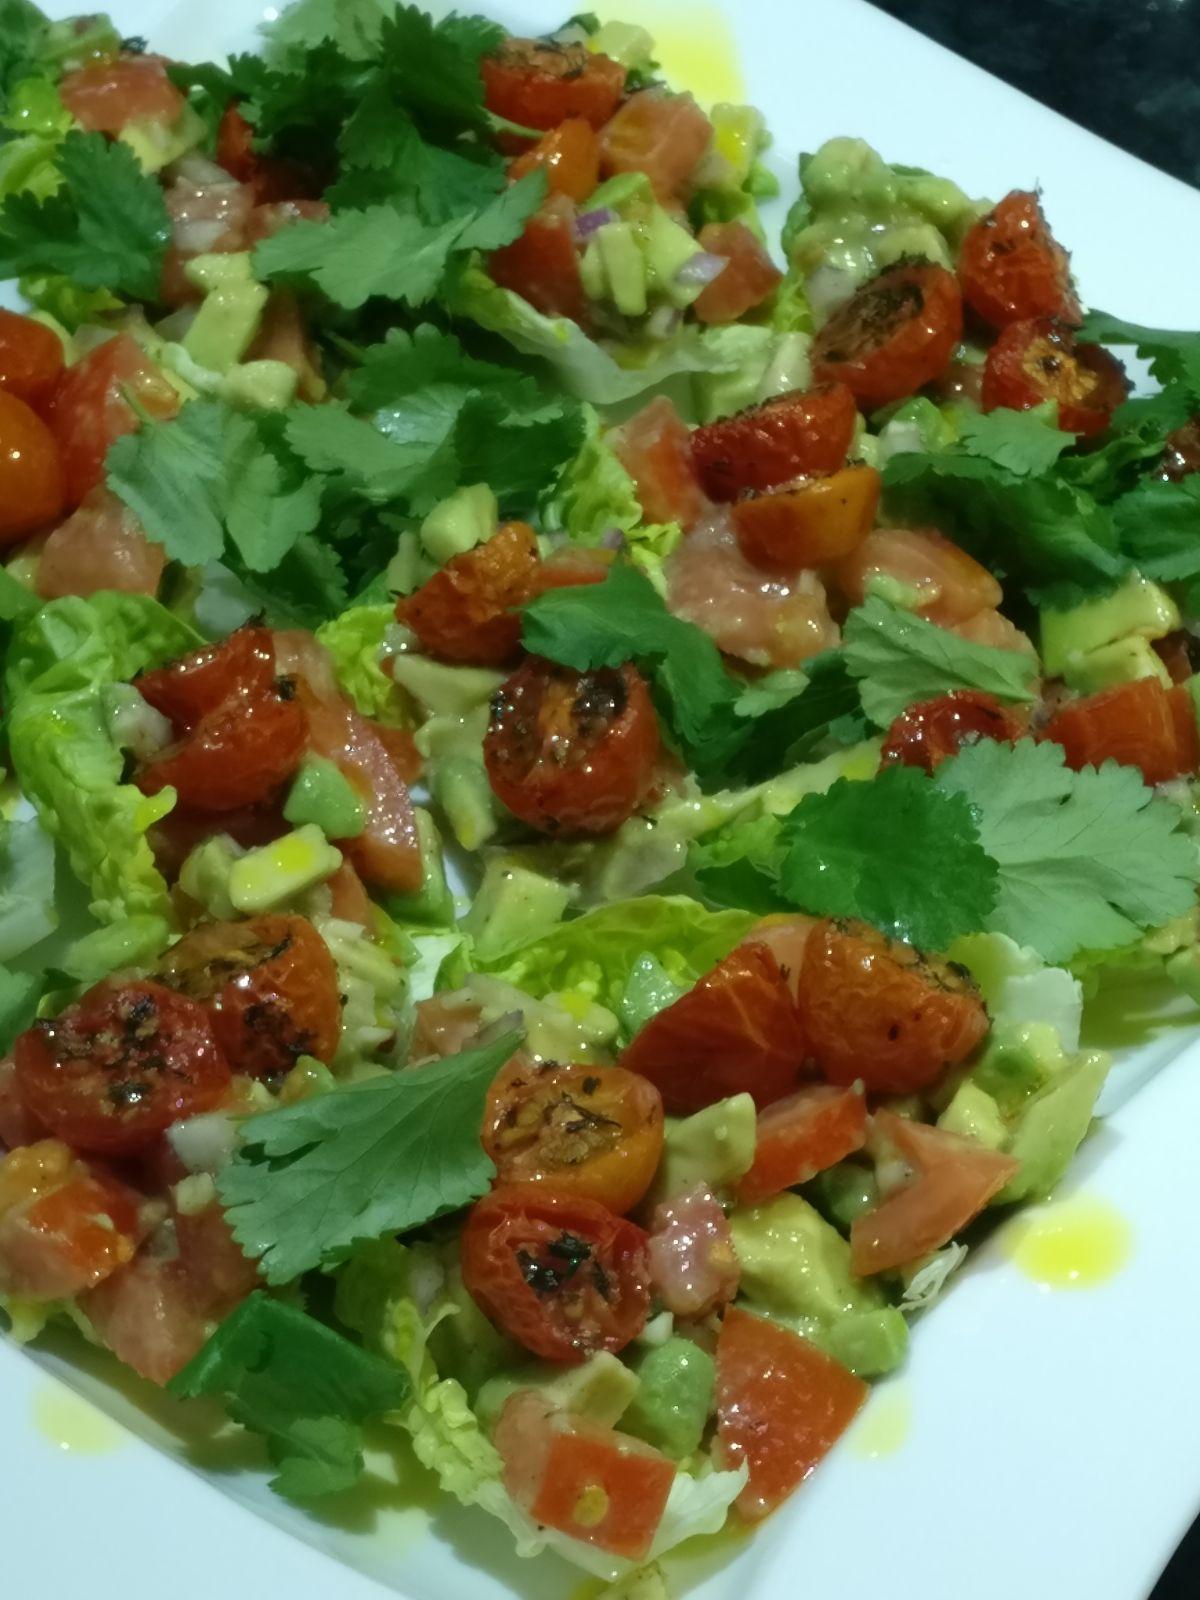 avocado salad with lettuce